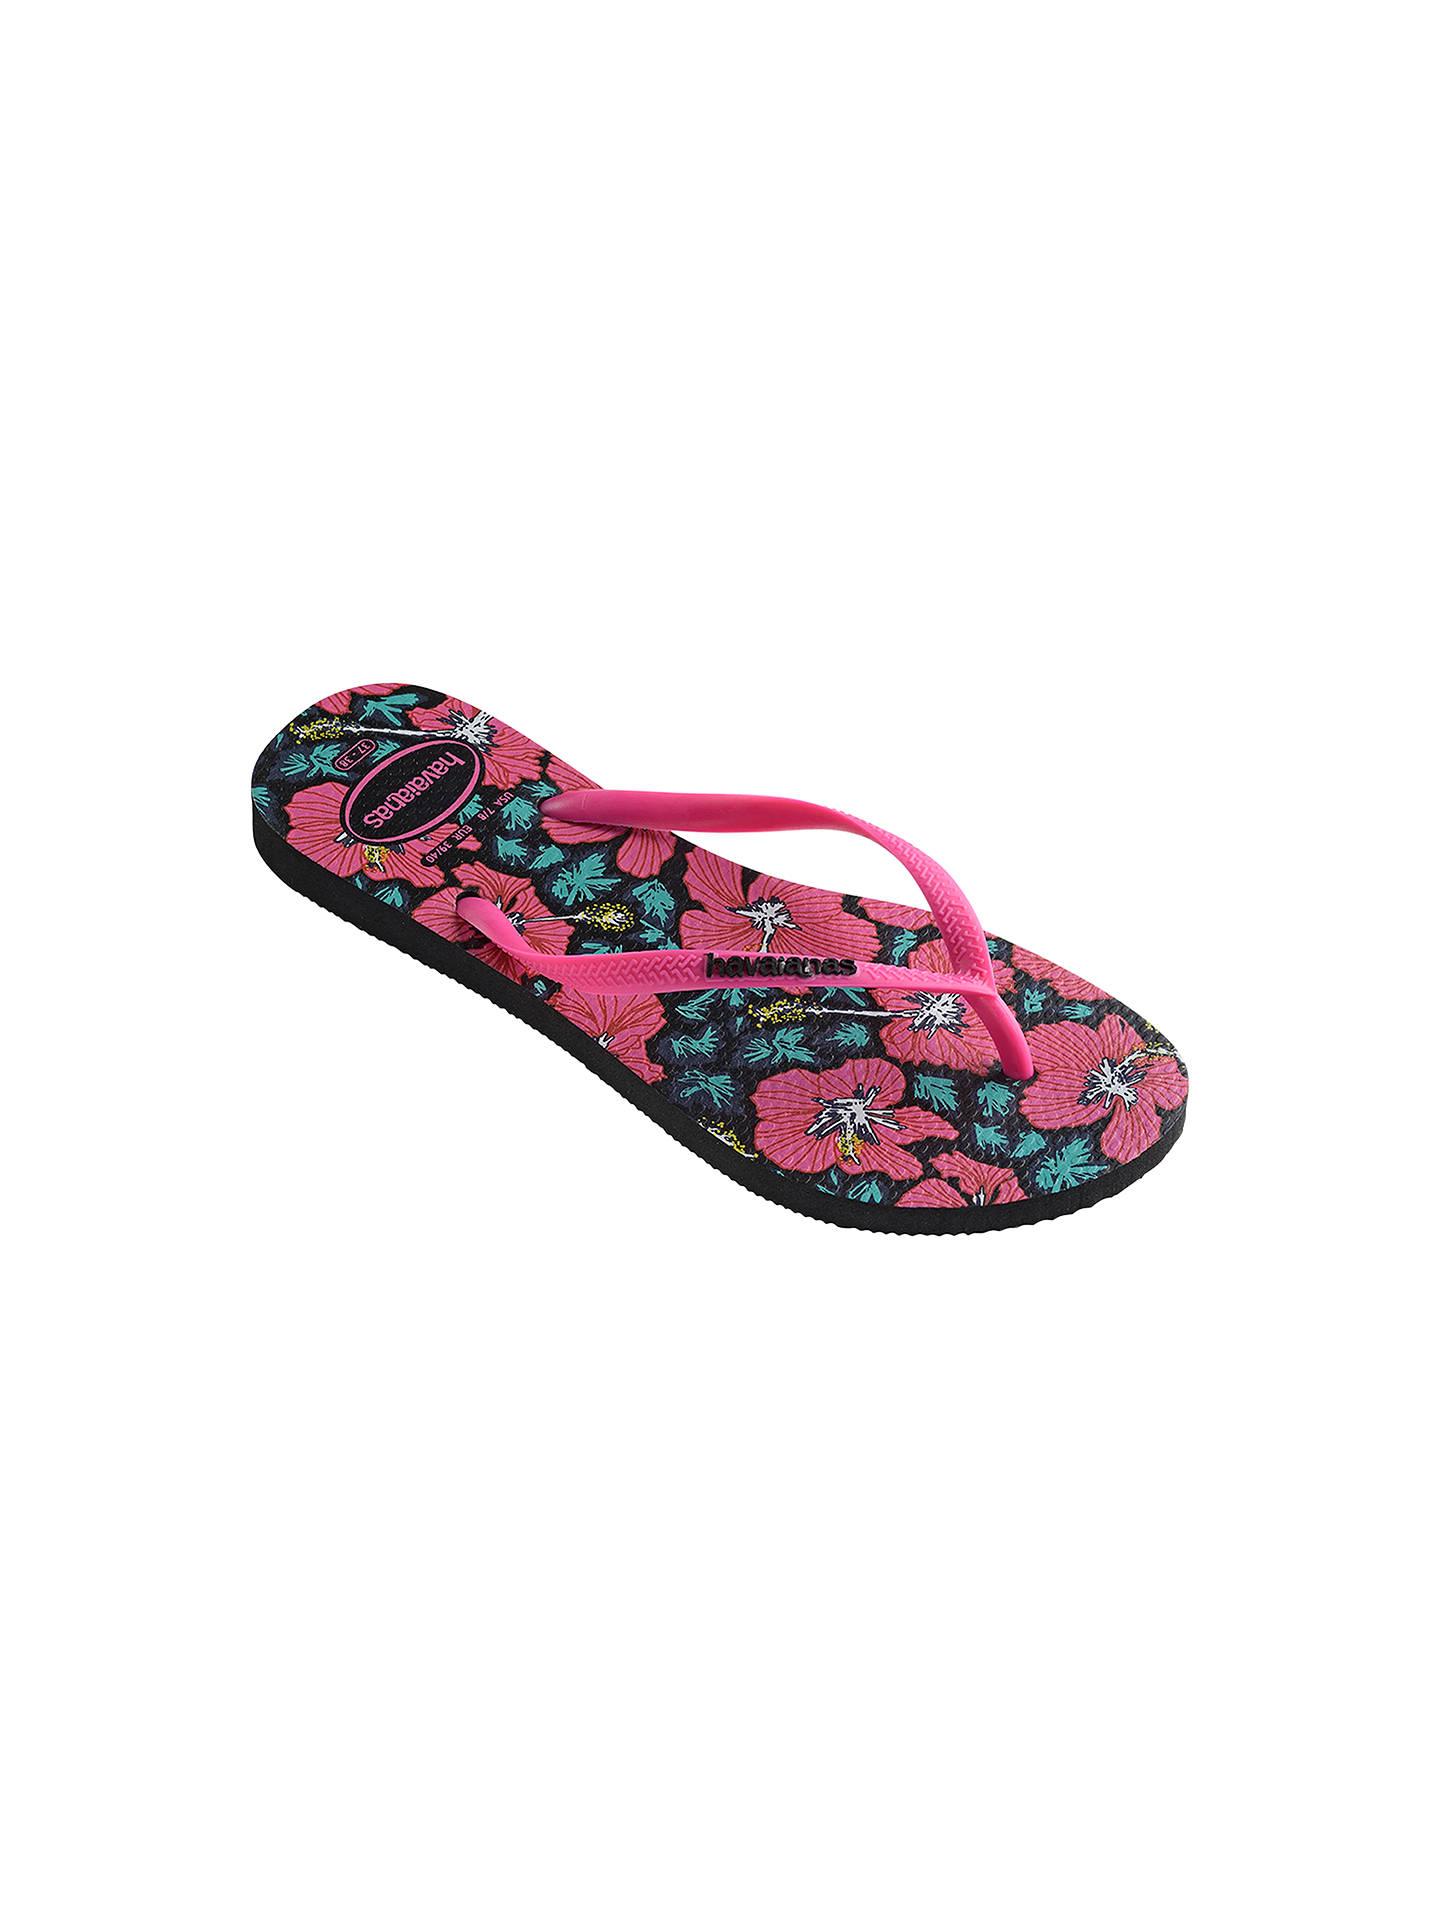 83ca76a7f32d45 Buy Havaianas Slim Floral Flip Flops